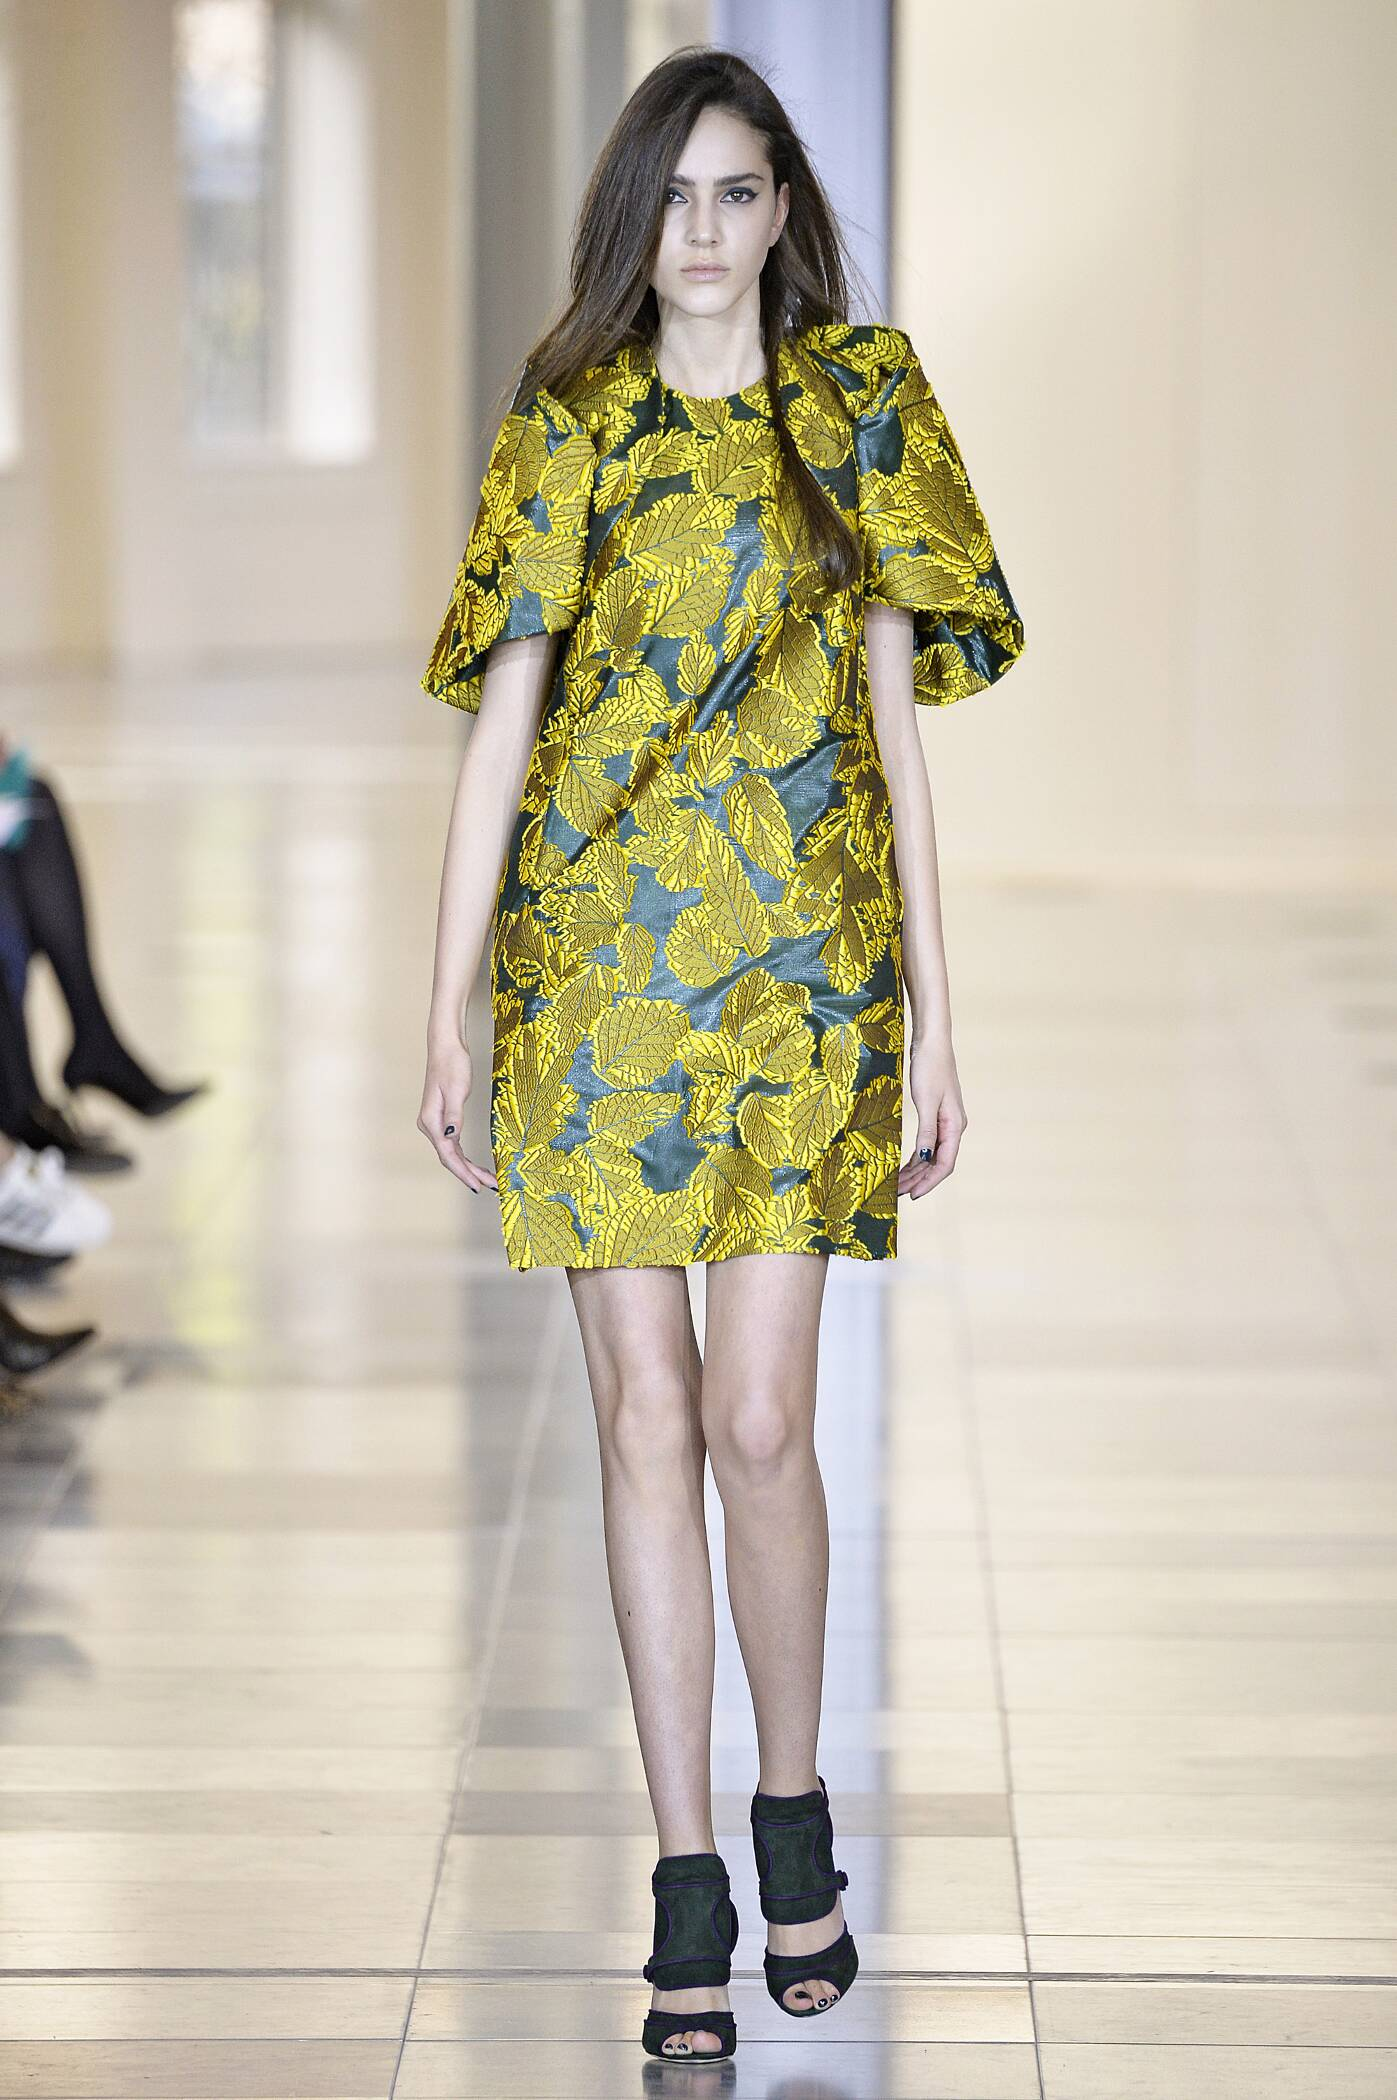 Winter 2015 Fashion Show Antonio Berardi Collection